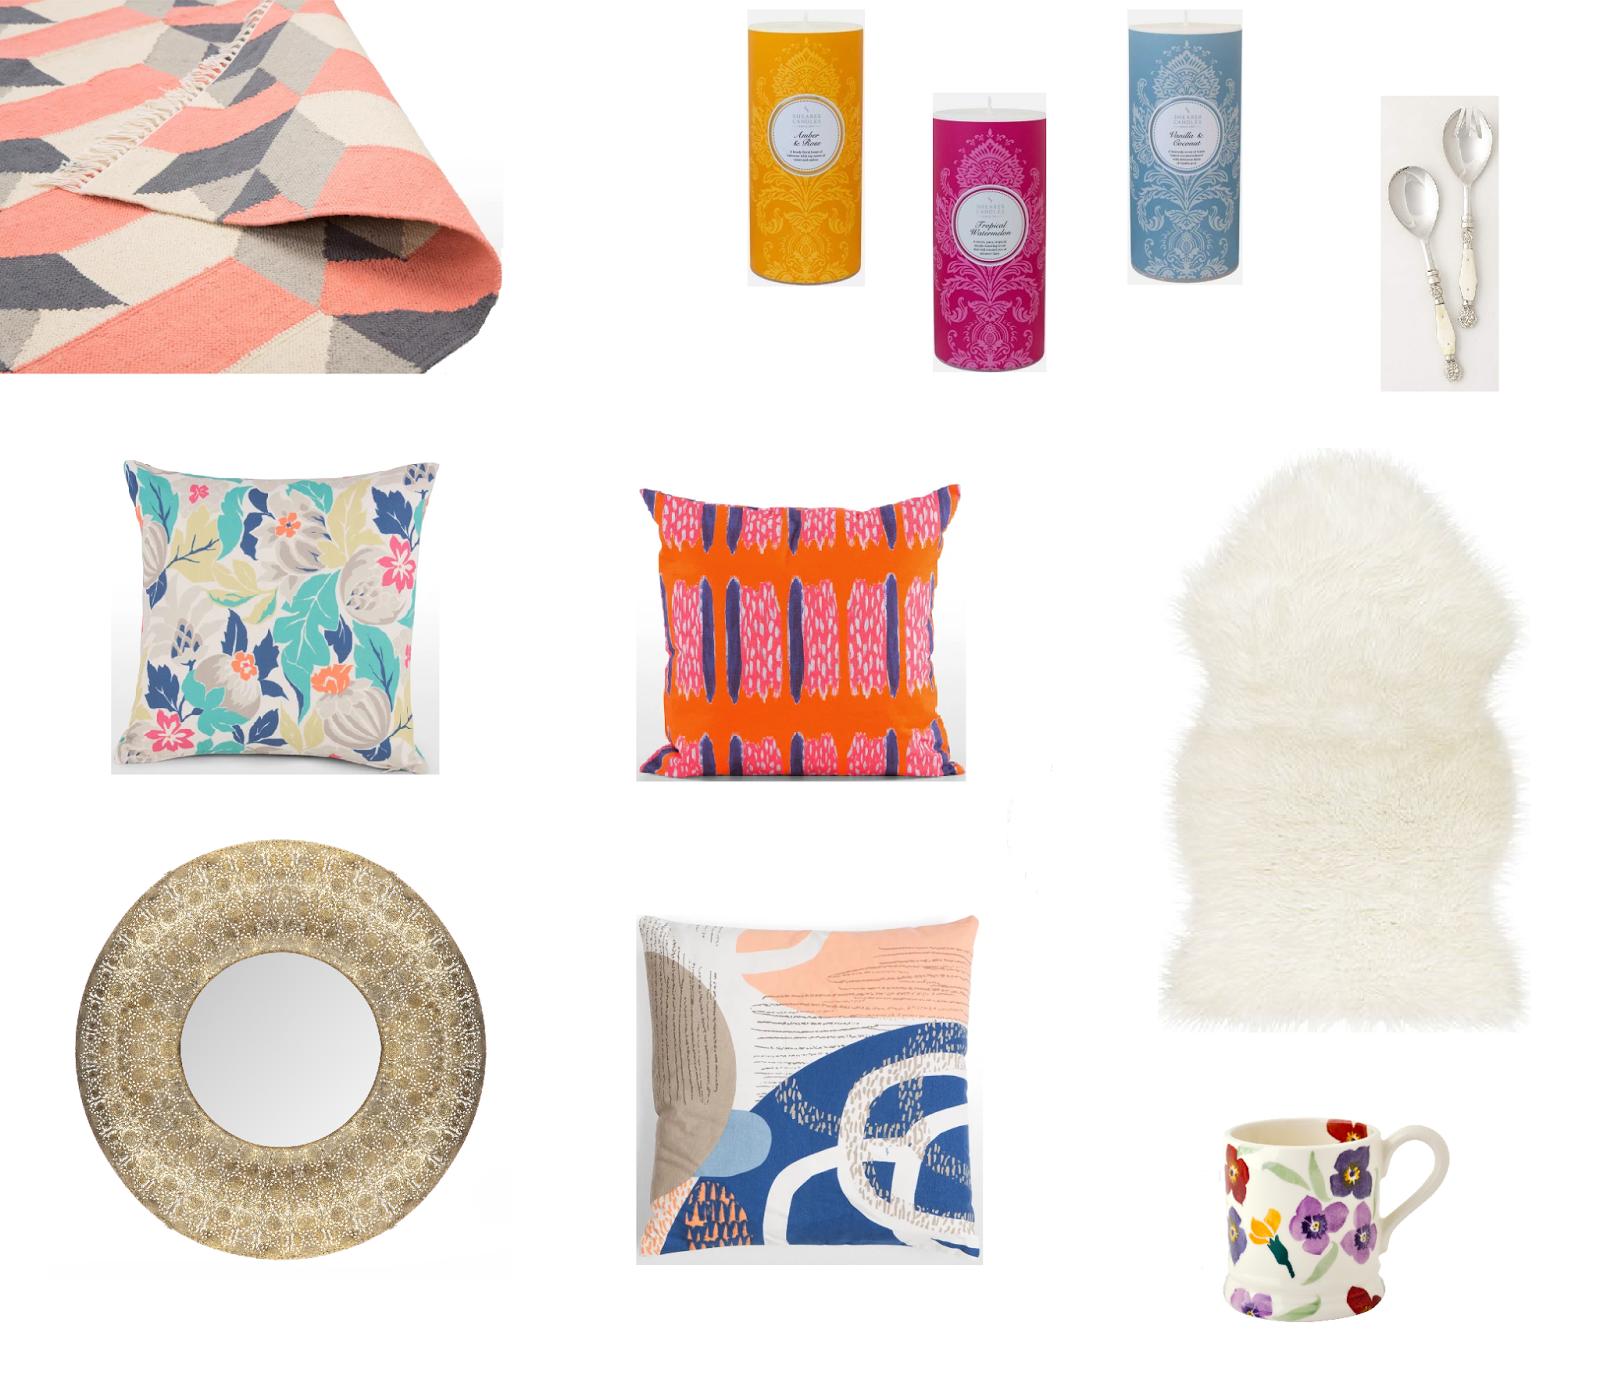 Sheepskin Rug Edinburgh: UK Interior Designer Blog, Interior Wishlist, Decoration